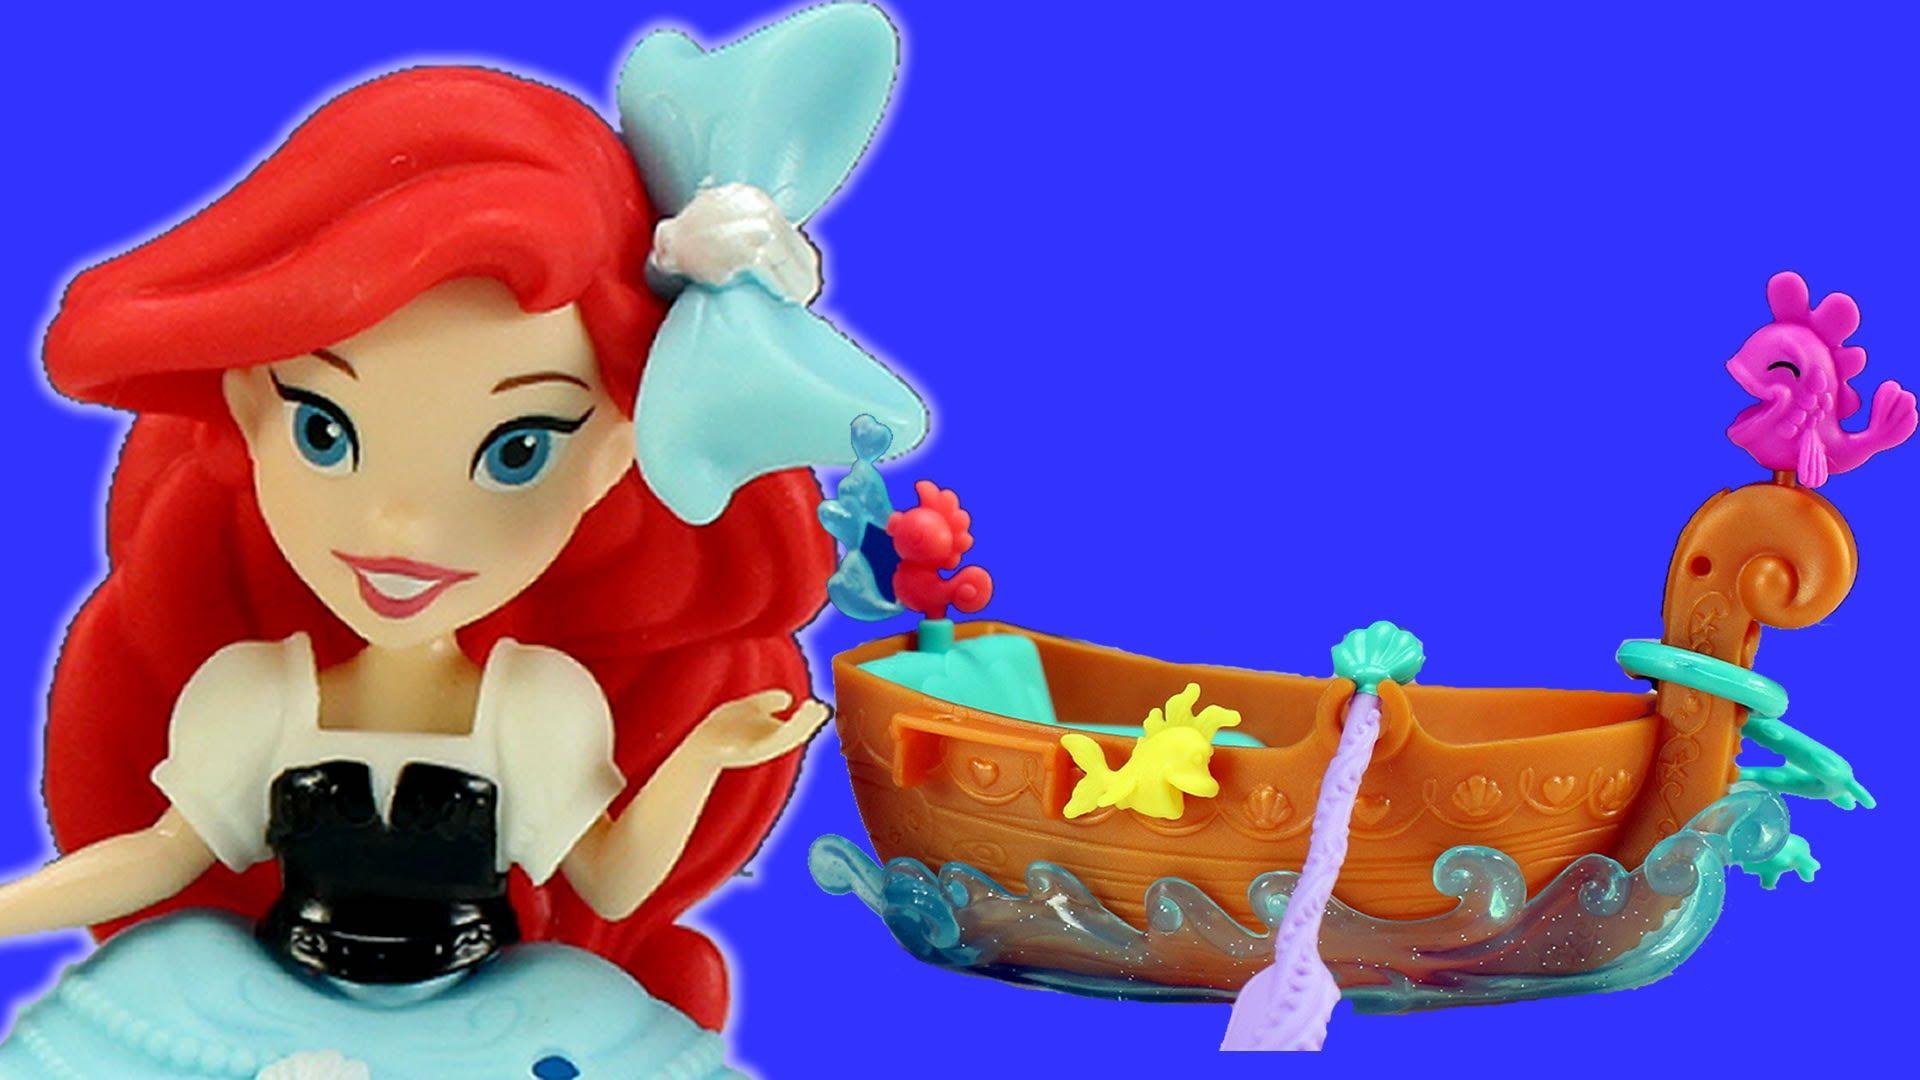 Disney Princess Ariel The Little Mermaid Boat Toy Disney